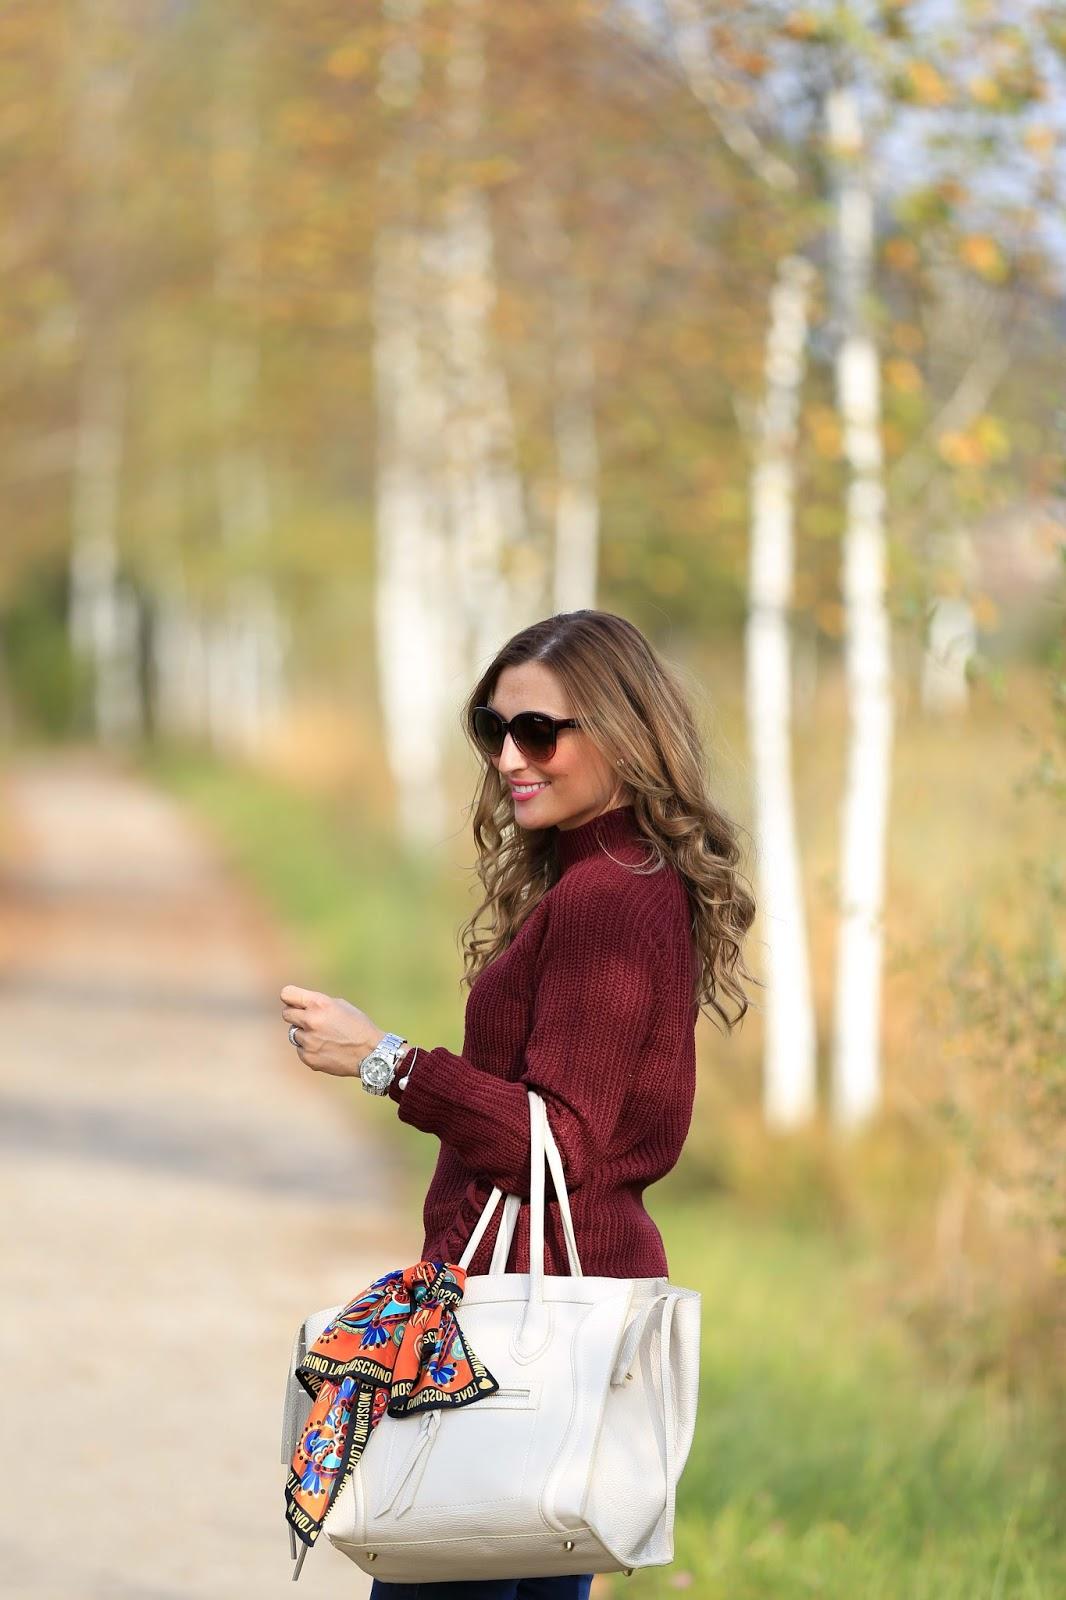 Celine Bag - Beige Tasche kombinieren- wie trage ich einen Rolli - Herbstlook - Blogger Herbstlook - Musthaves im Herbst - Bordeaux - Beige- Pulloiver in Bordeaux - Bordeaux Bloggerpulli - Blogger aus Frankfurt